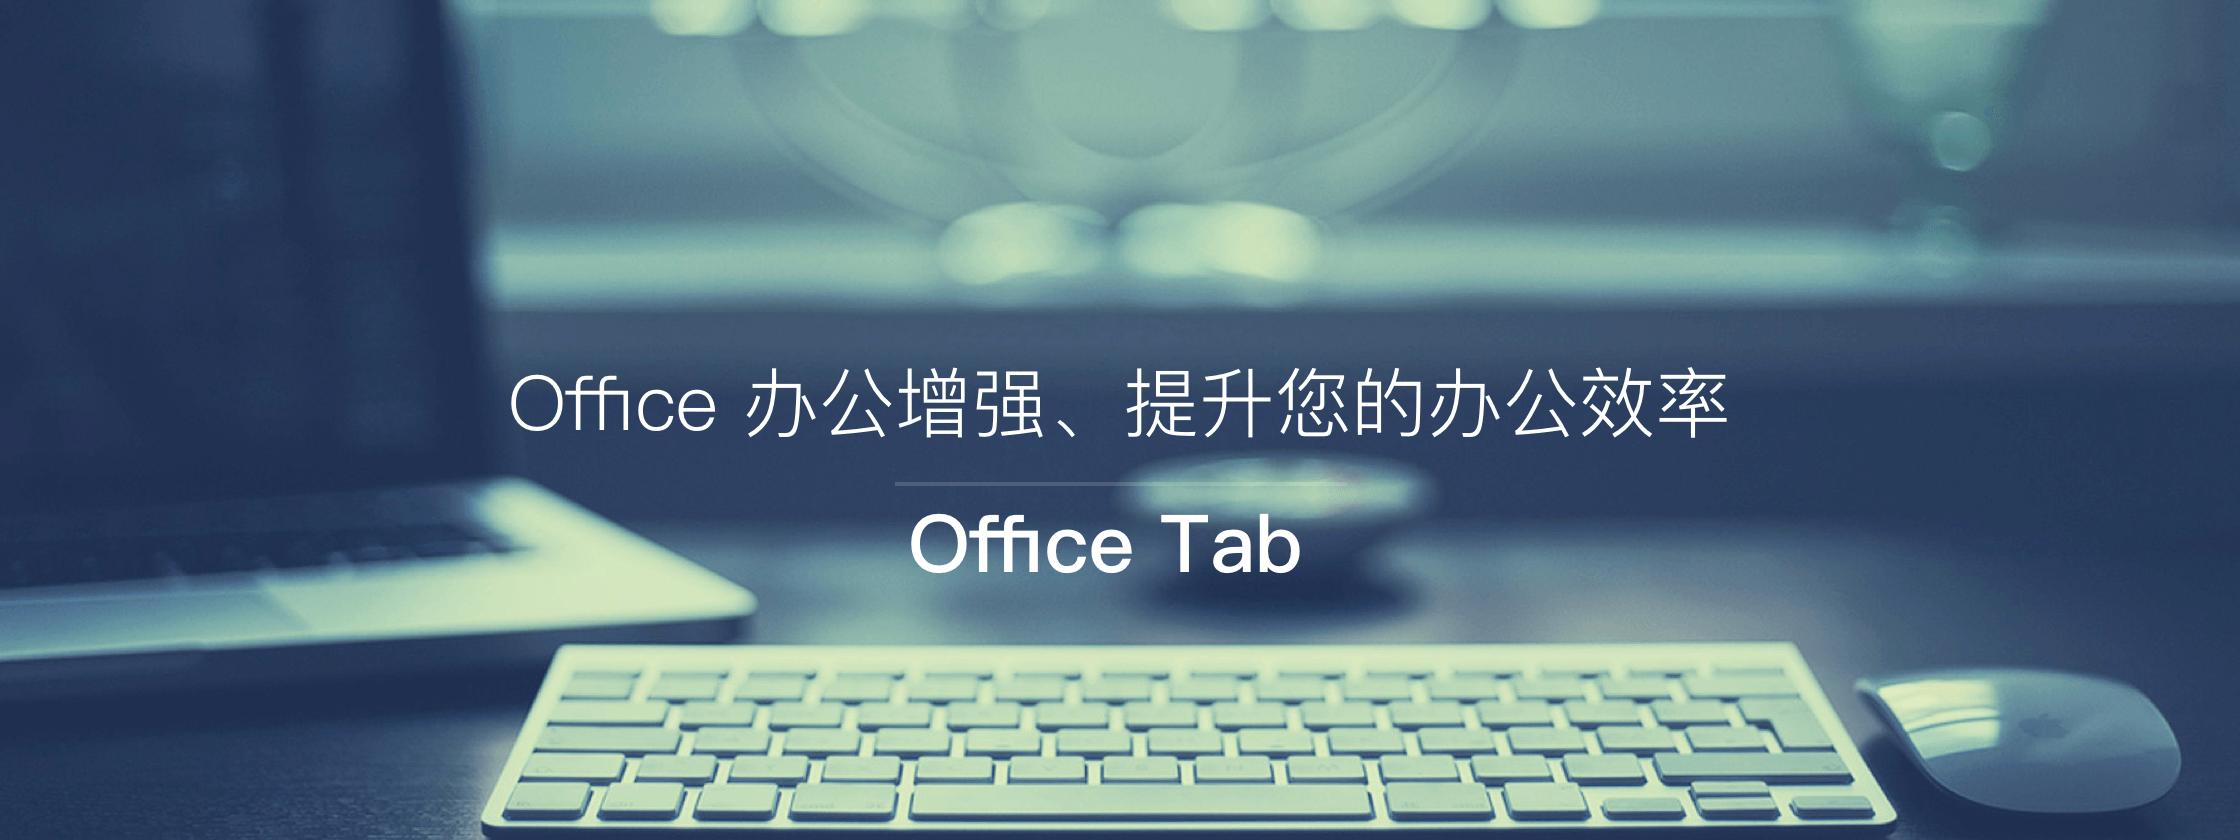 Office Tab – Office 办公增强、提升您的办公效率